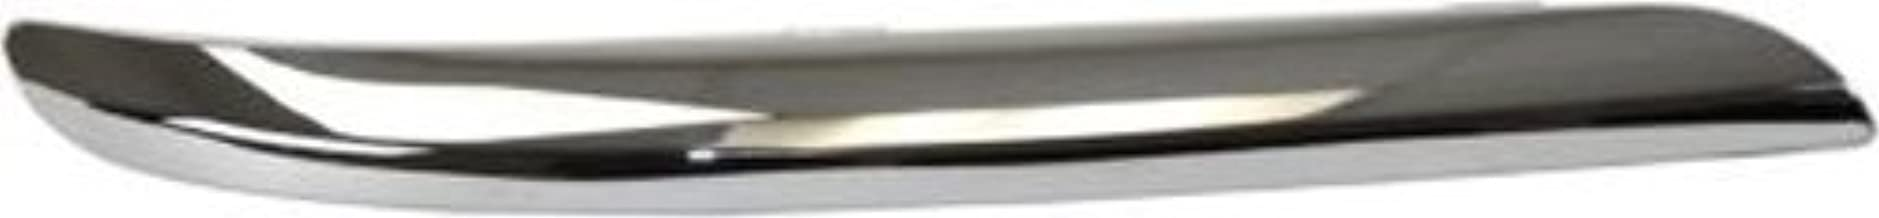 CPP Chrome Front, Passenger Side Bumper Trim for 2011-2014 Chrysler 300 CH1047103